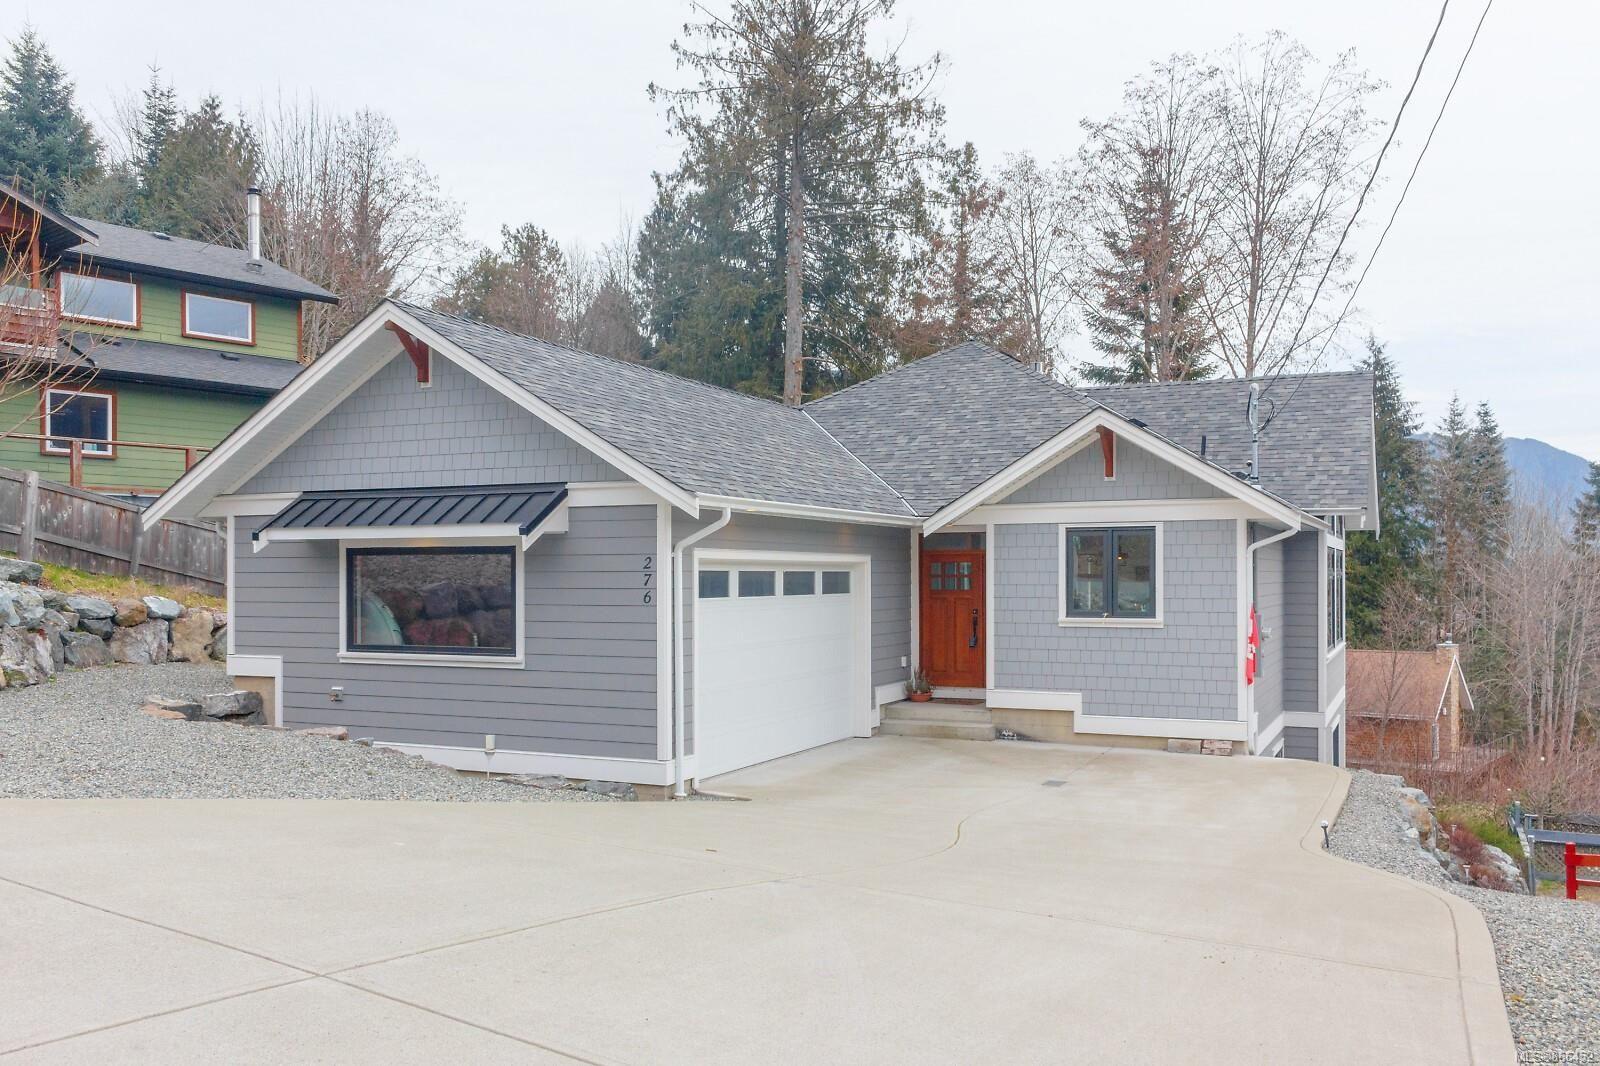 Main Photo: 276 Castley Hts in : Du Lake Cowichan House for sale (Duncan)  : MLS®# 866452